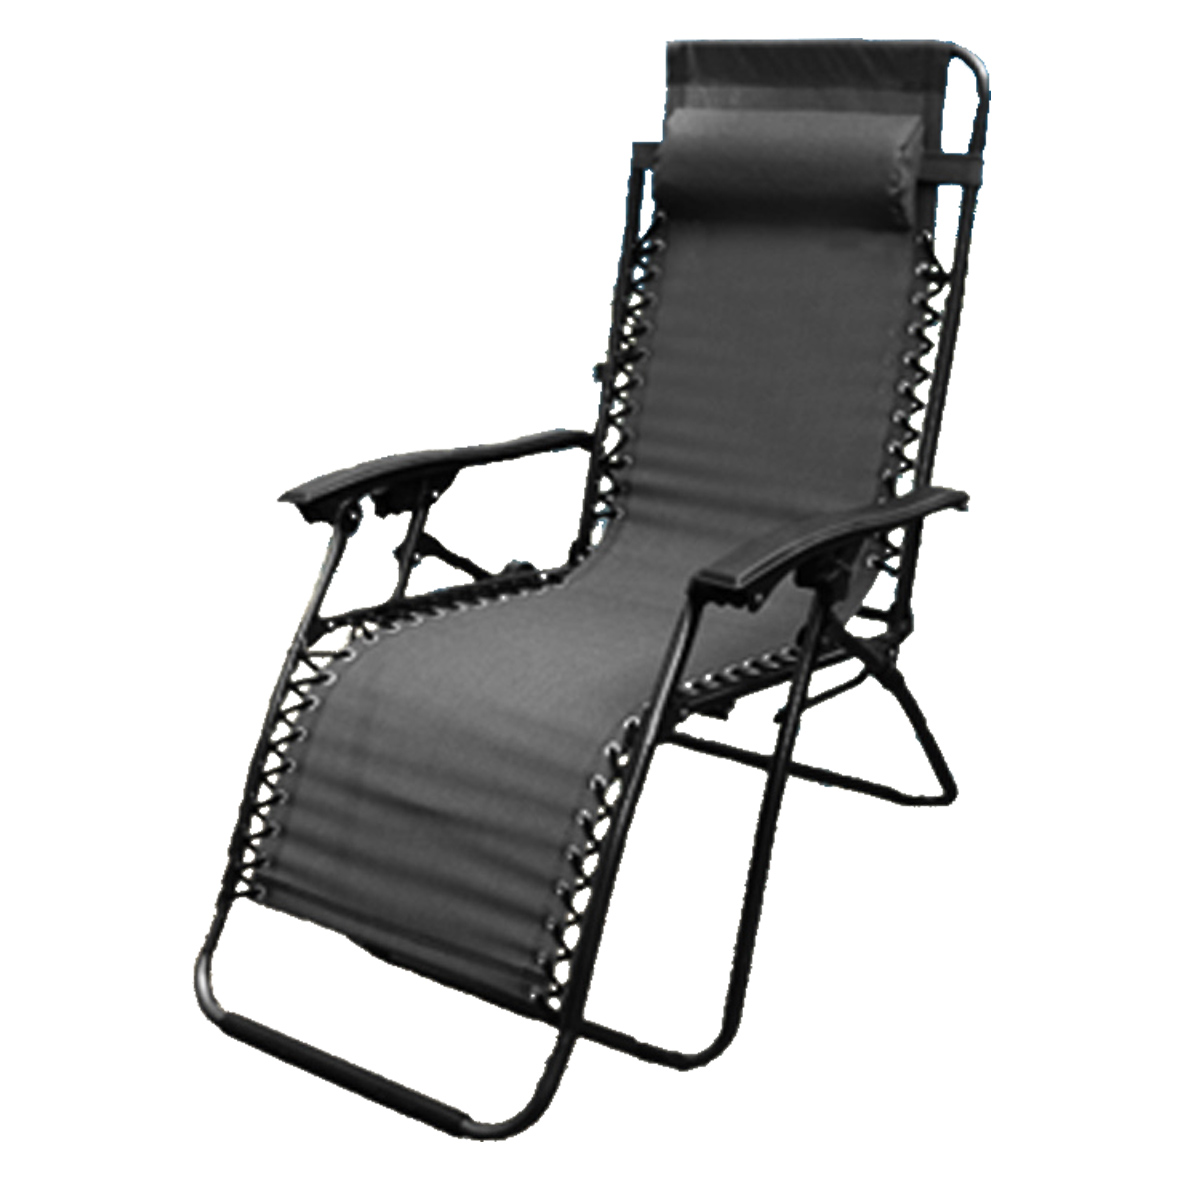 Textoline Zero Gravity Garden Reclining Recliner Relaxer Lounger Lounge Chair  sc 1 st  eBay & Textoline Zero Gravity Garden Reclining Recliner Relaxer Lounger ... islam-shia.org